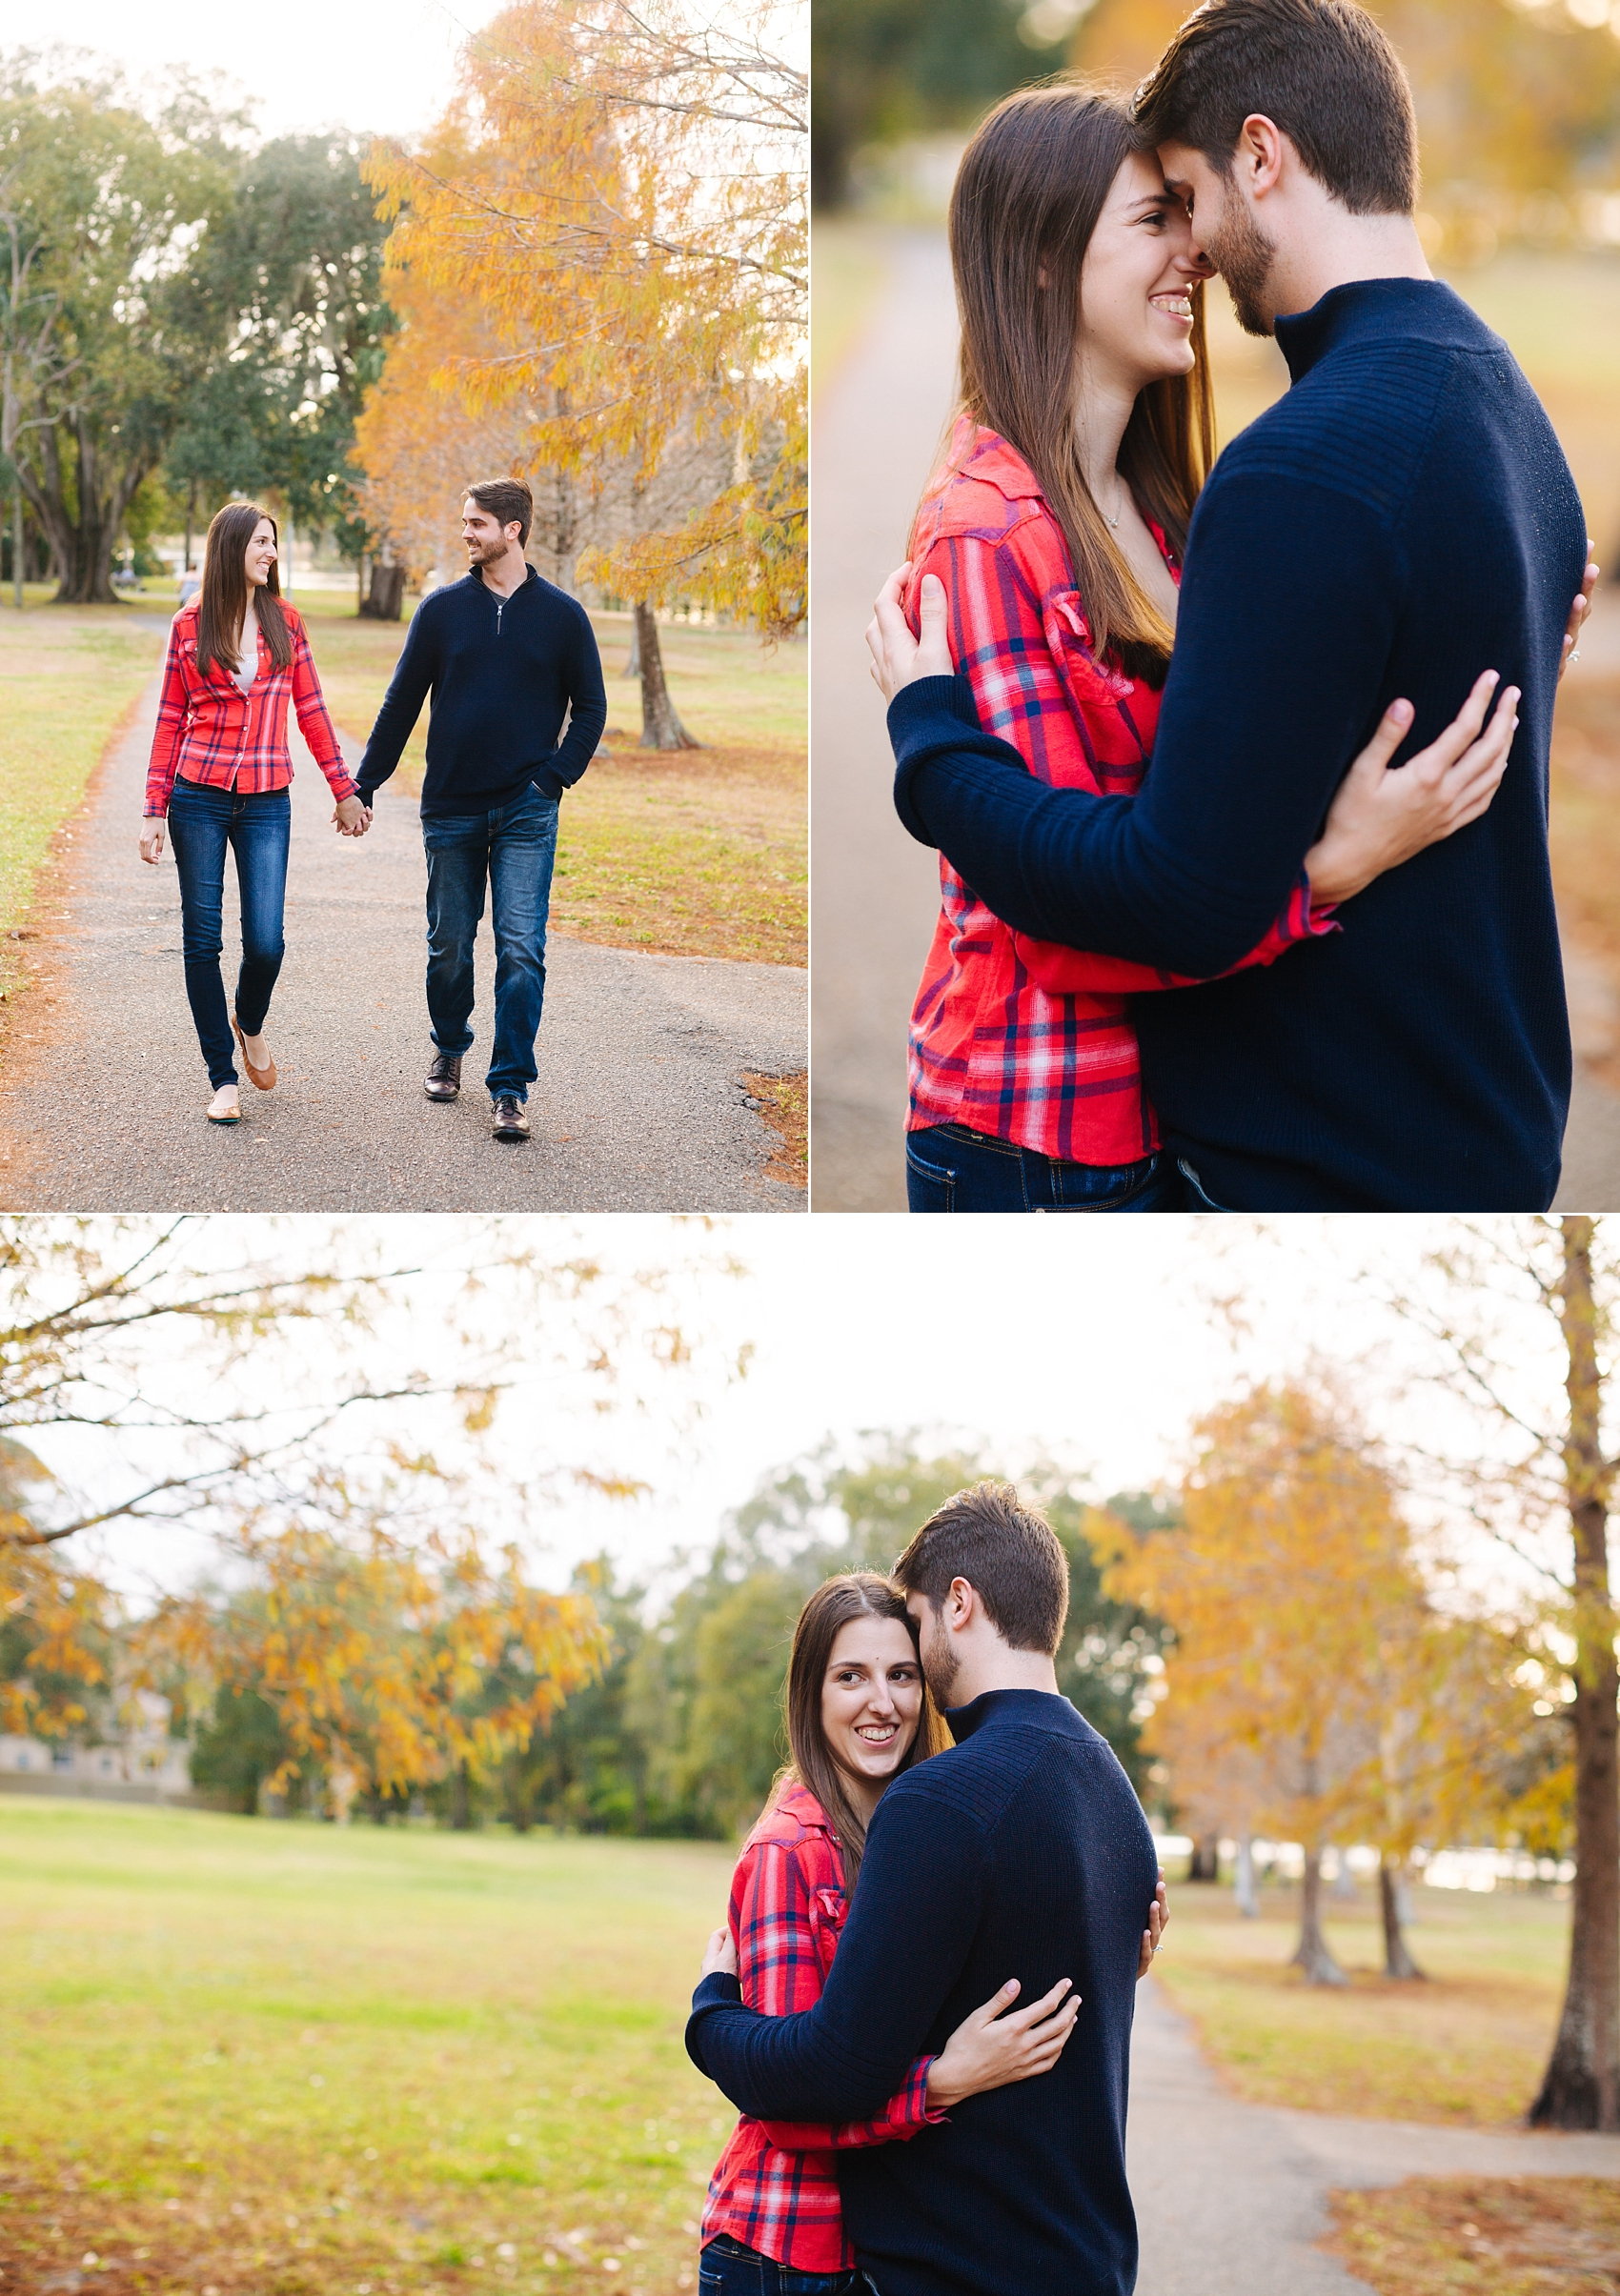 Jake & Katie Photography Seminole Heights Engagement Photos David & Cailyn-011.jpg